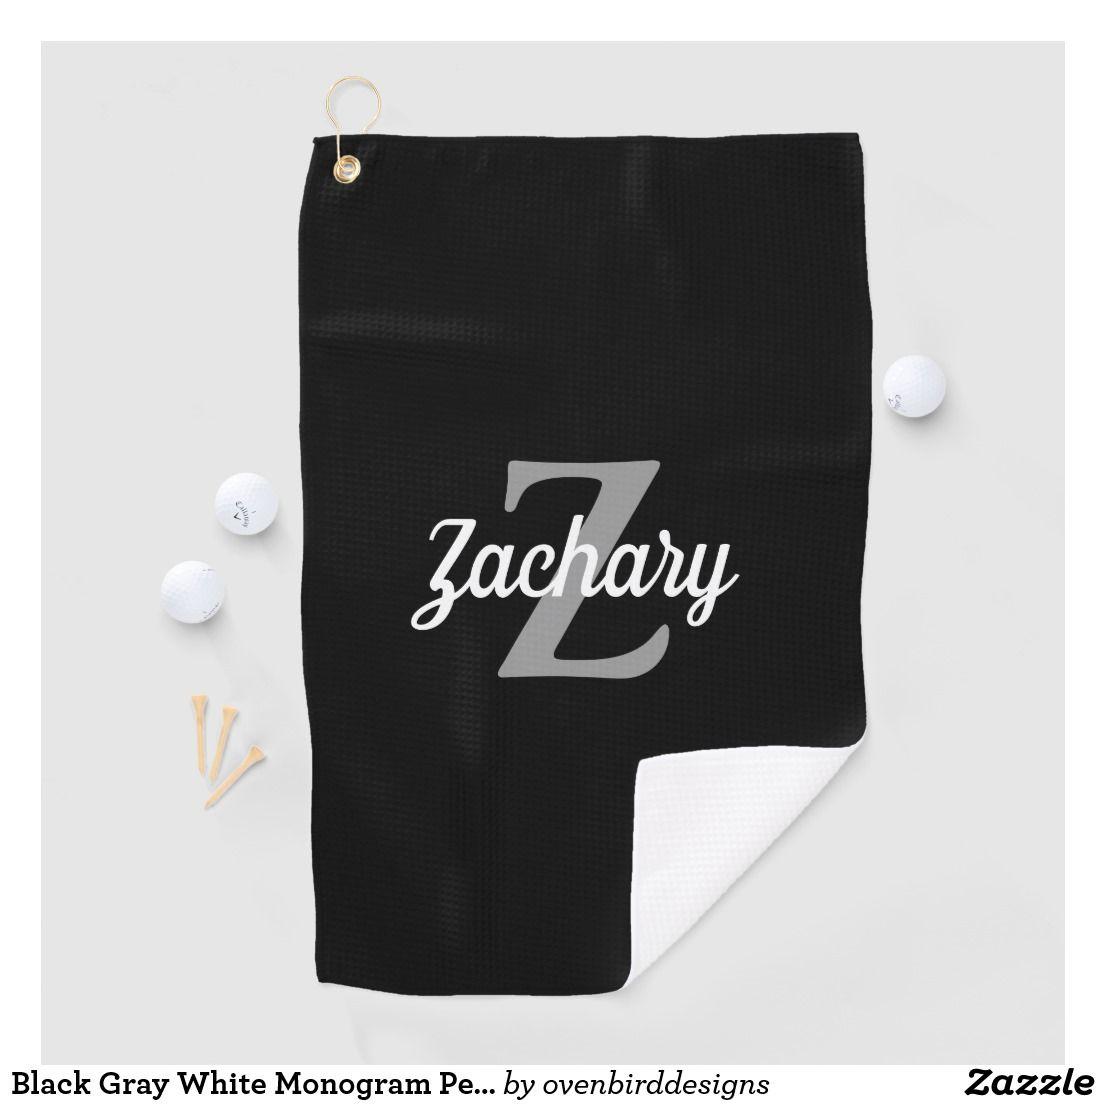 Black gray white monogram personalized golf towel zazzle